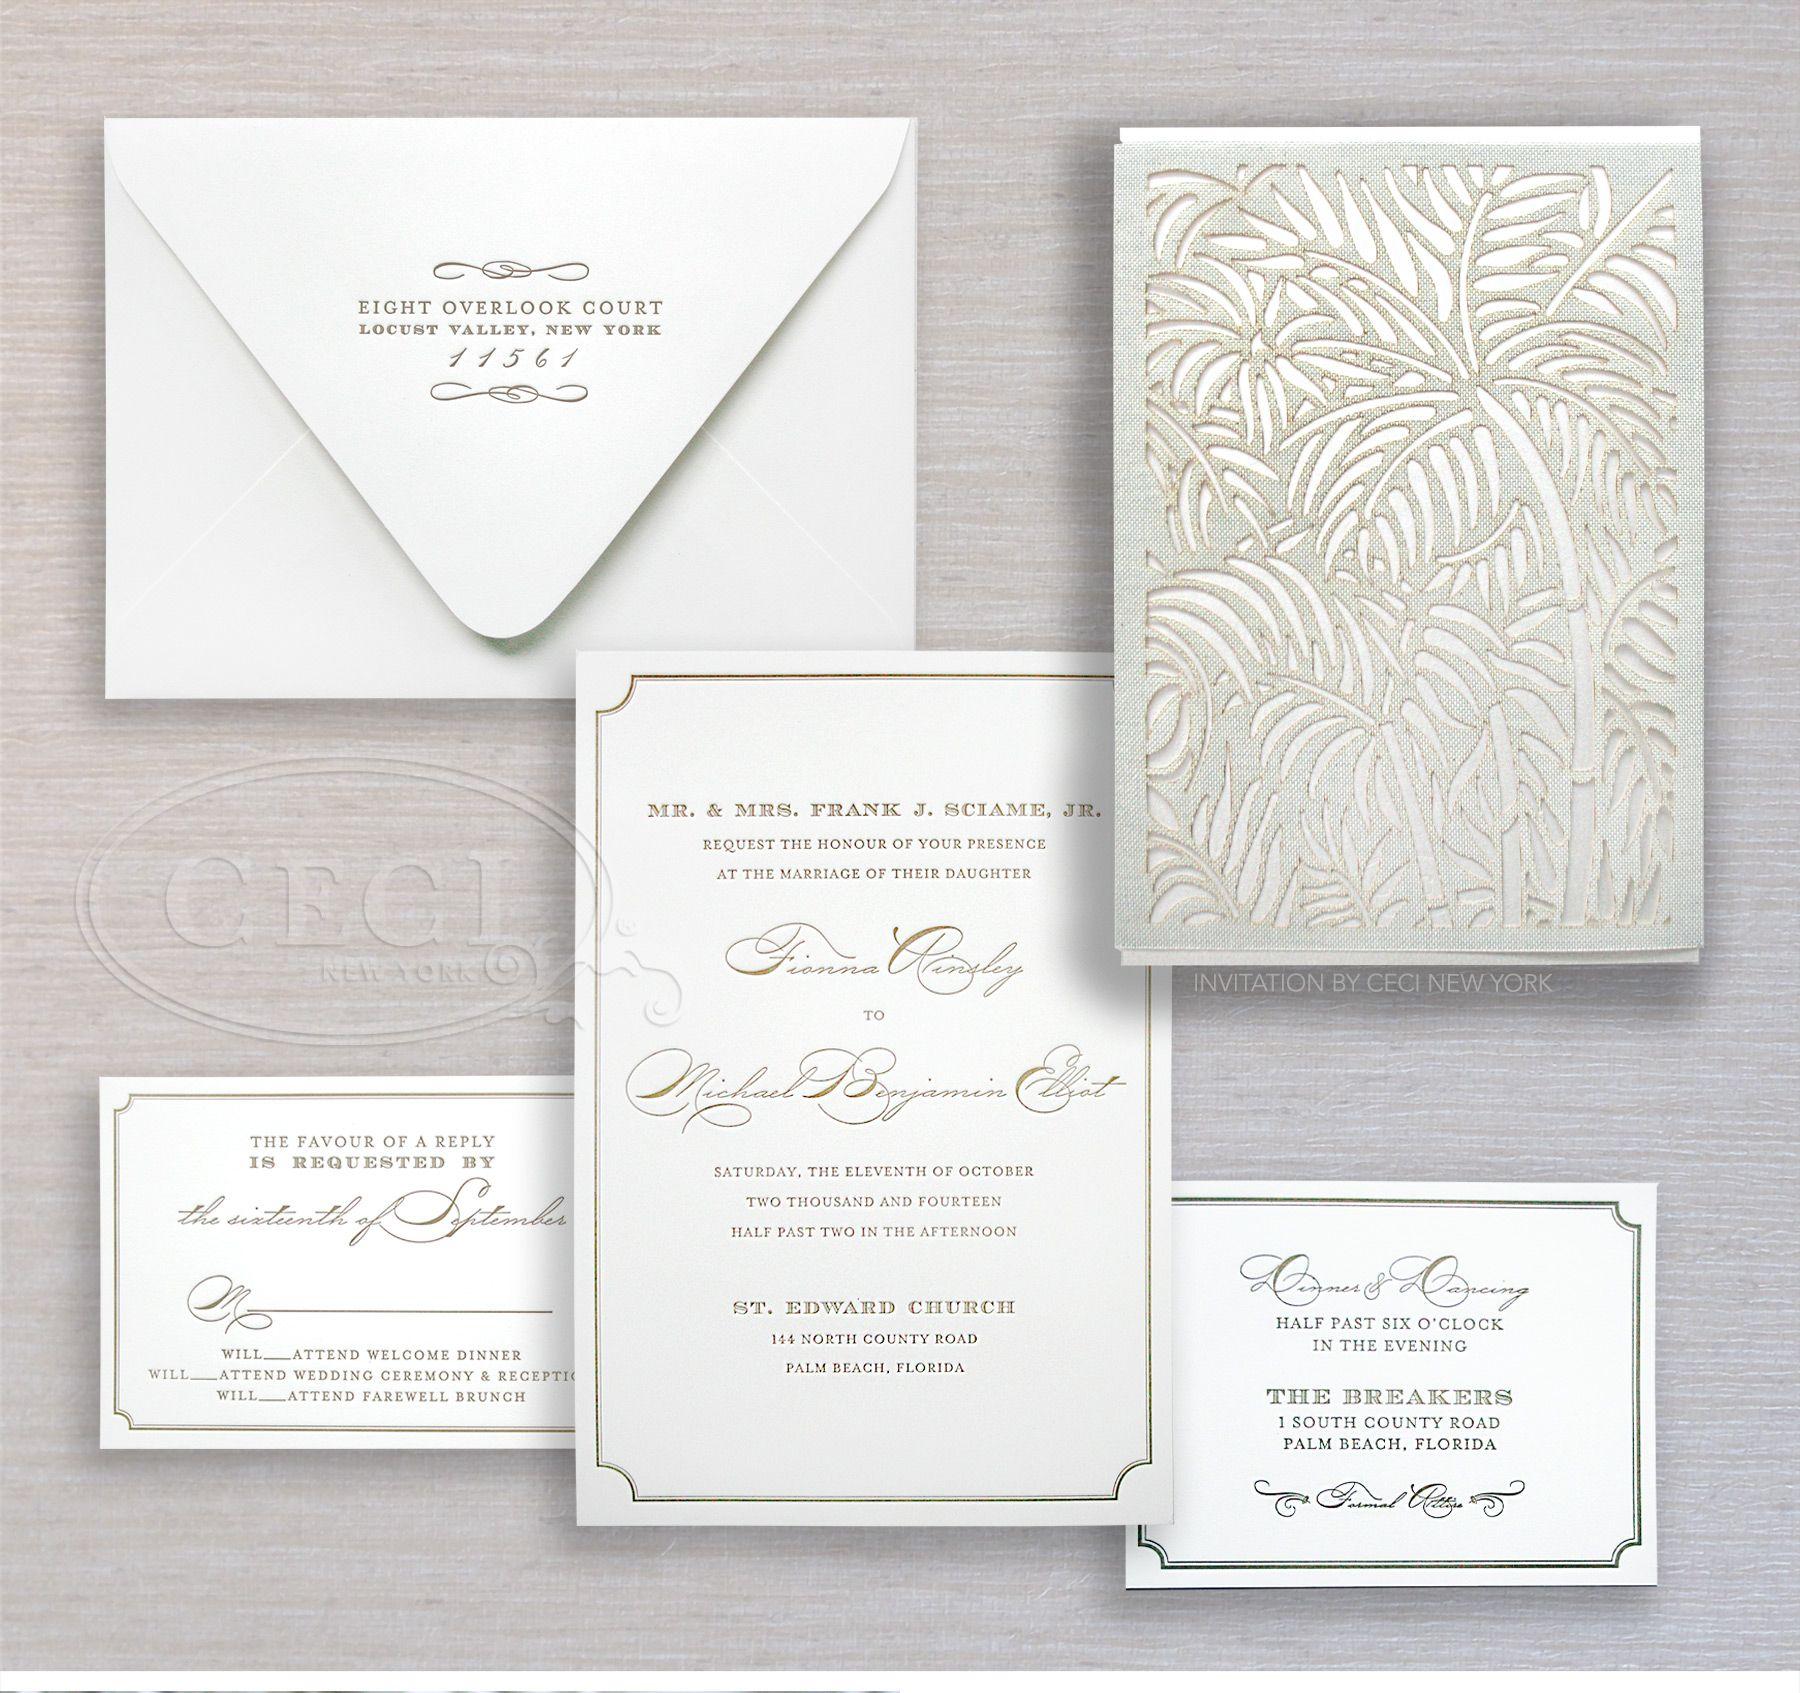 Best Michaels Wedding Invitations Free